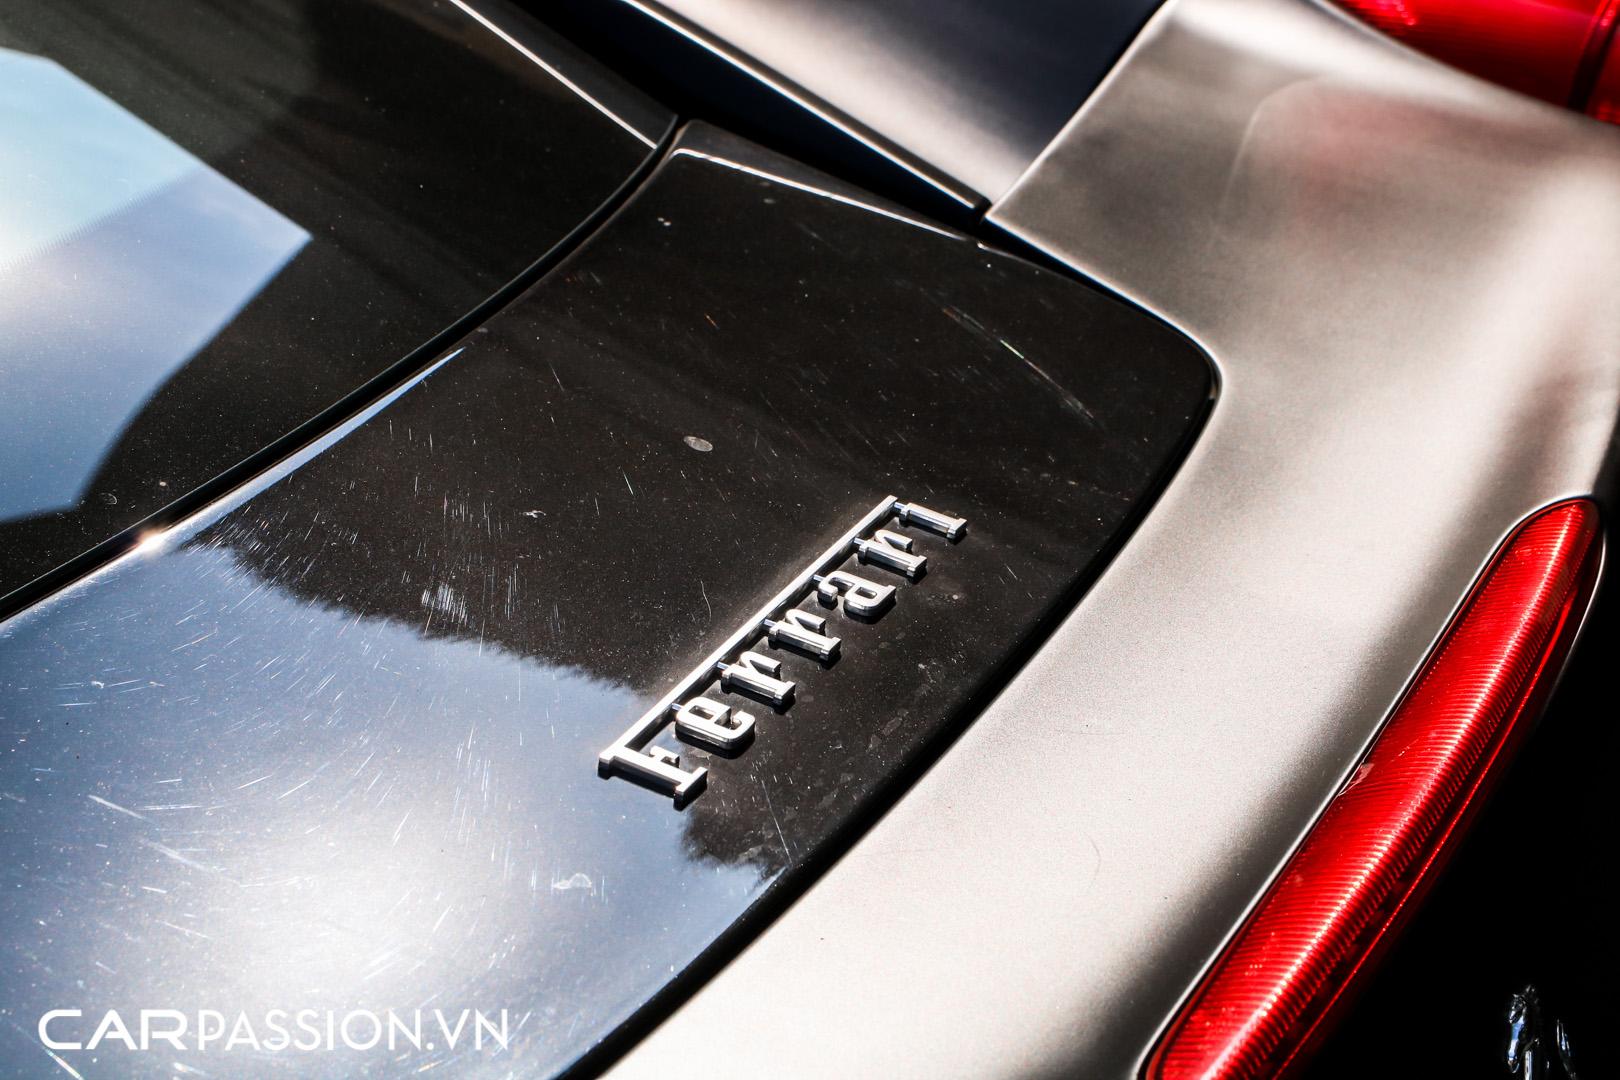 Ferrari 458 Italia đen mờ9.JPG